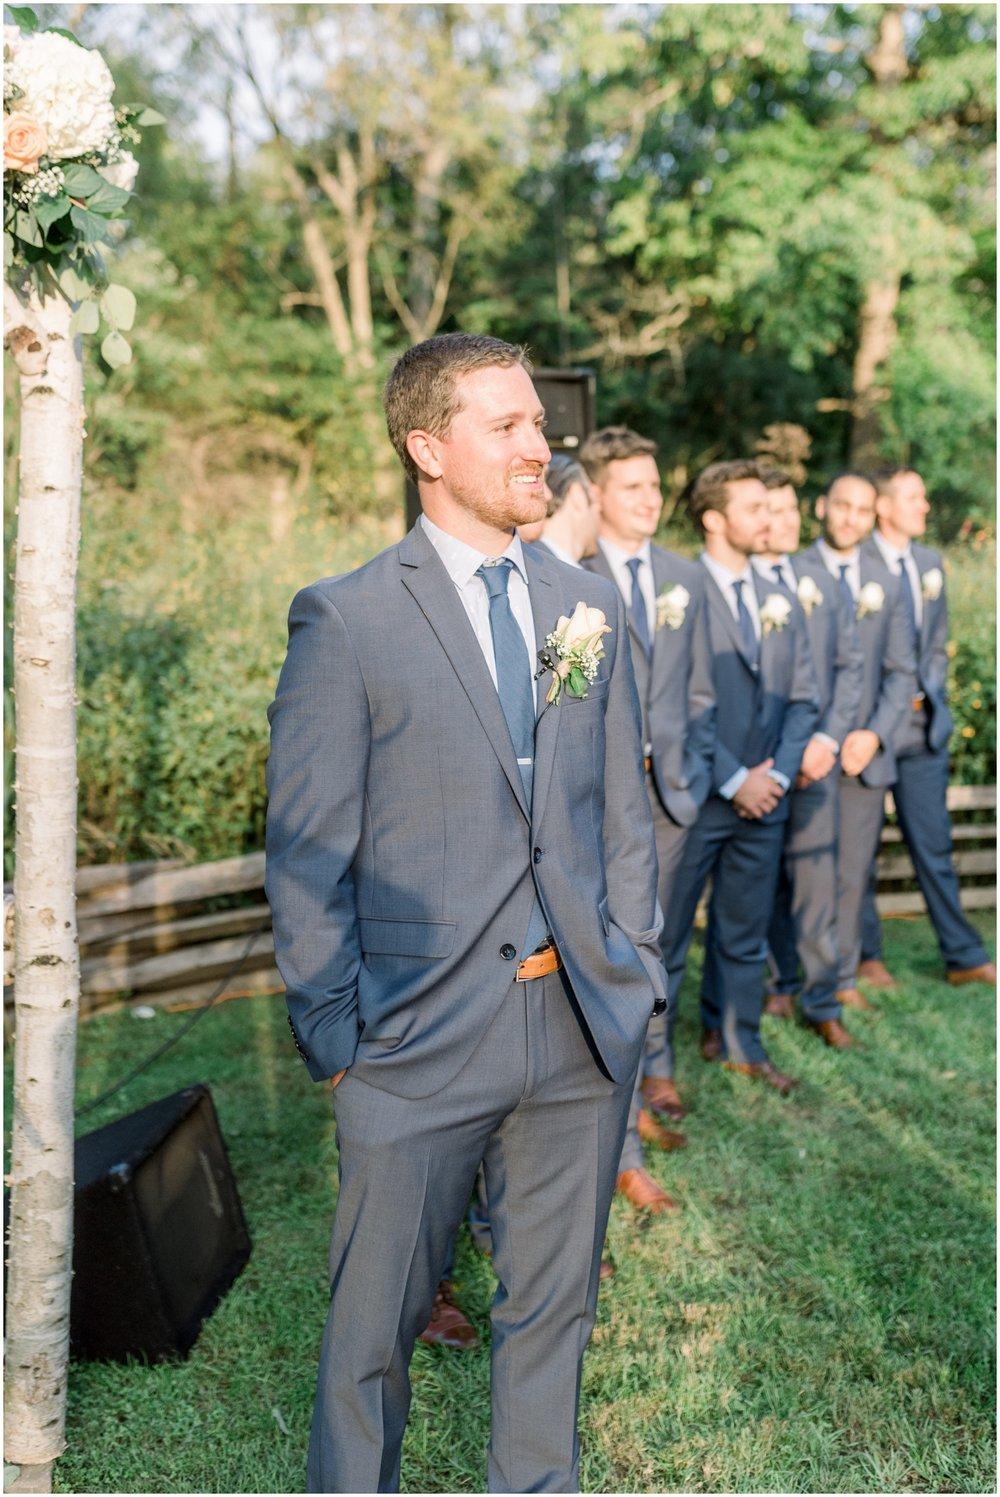 Summer Wedding at Philander Chase Knox Estate in Malvern, PA - Krista Brackin Photography_0115.jpg